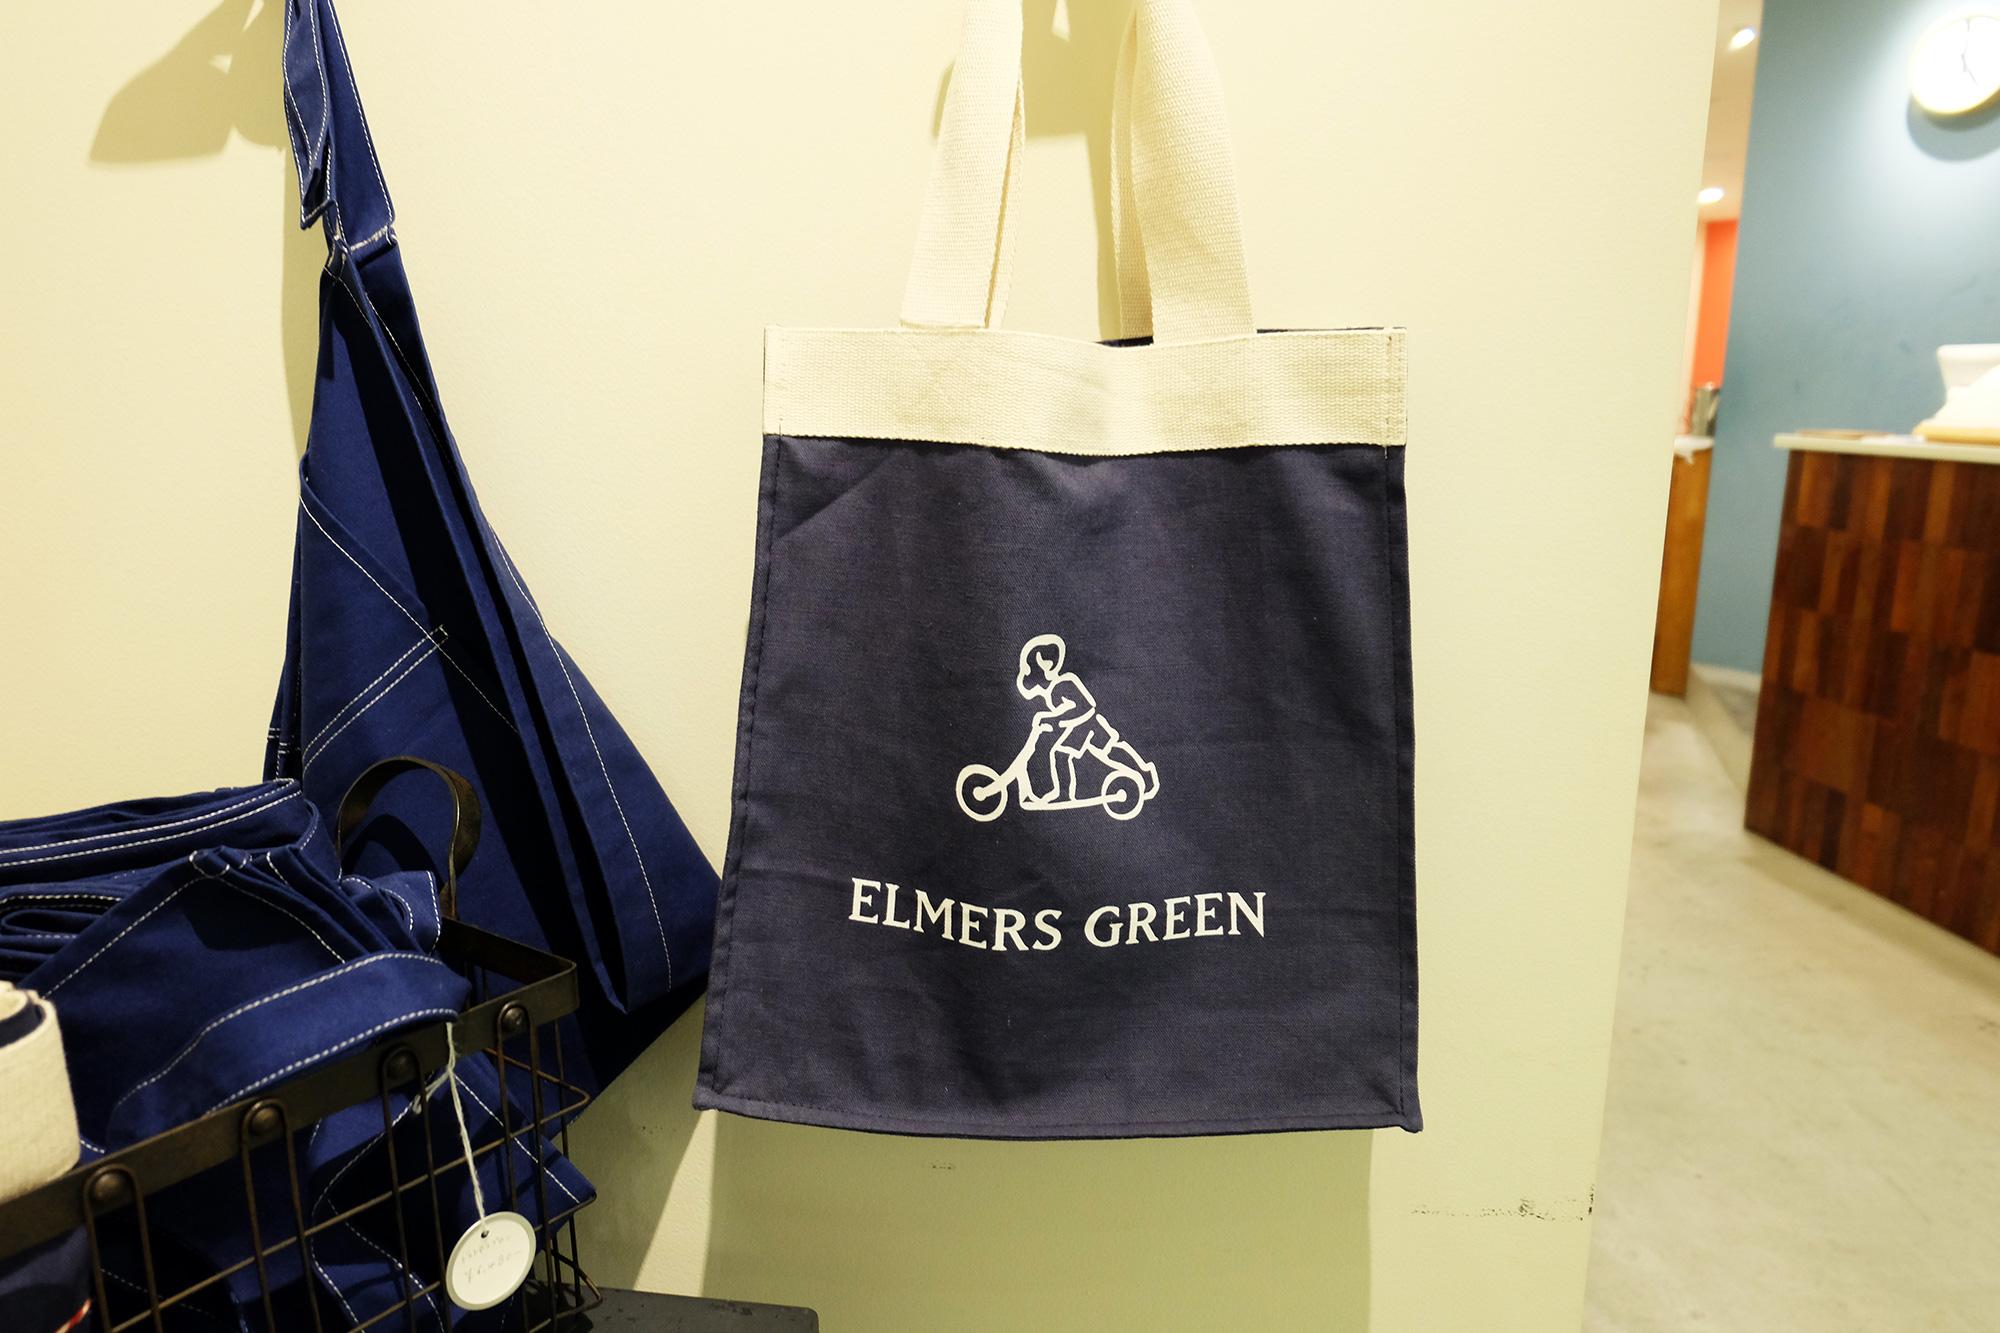 ELMERS GREEN IN THE PARK エルマーズグリーンインザパーク